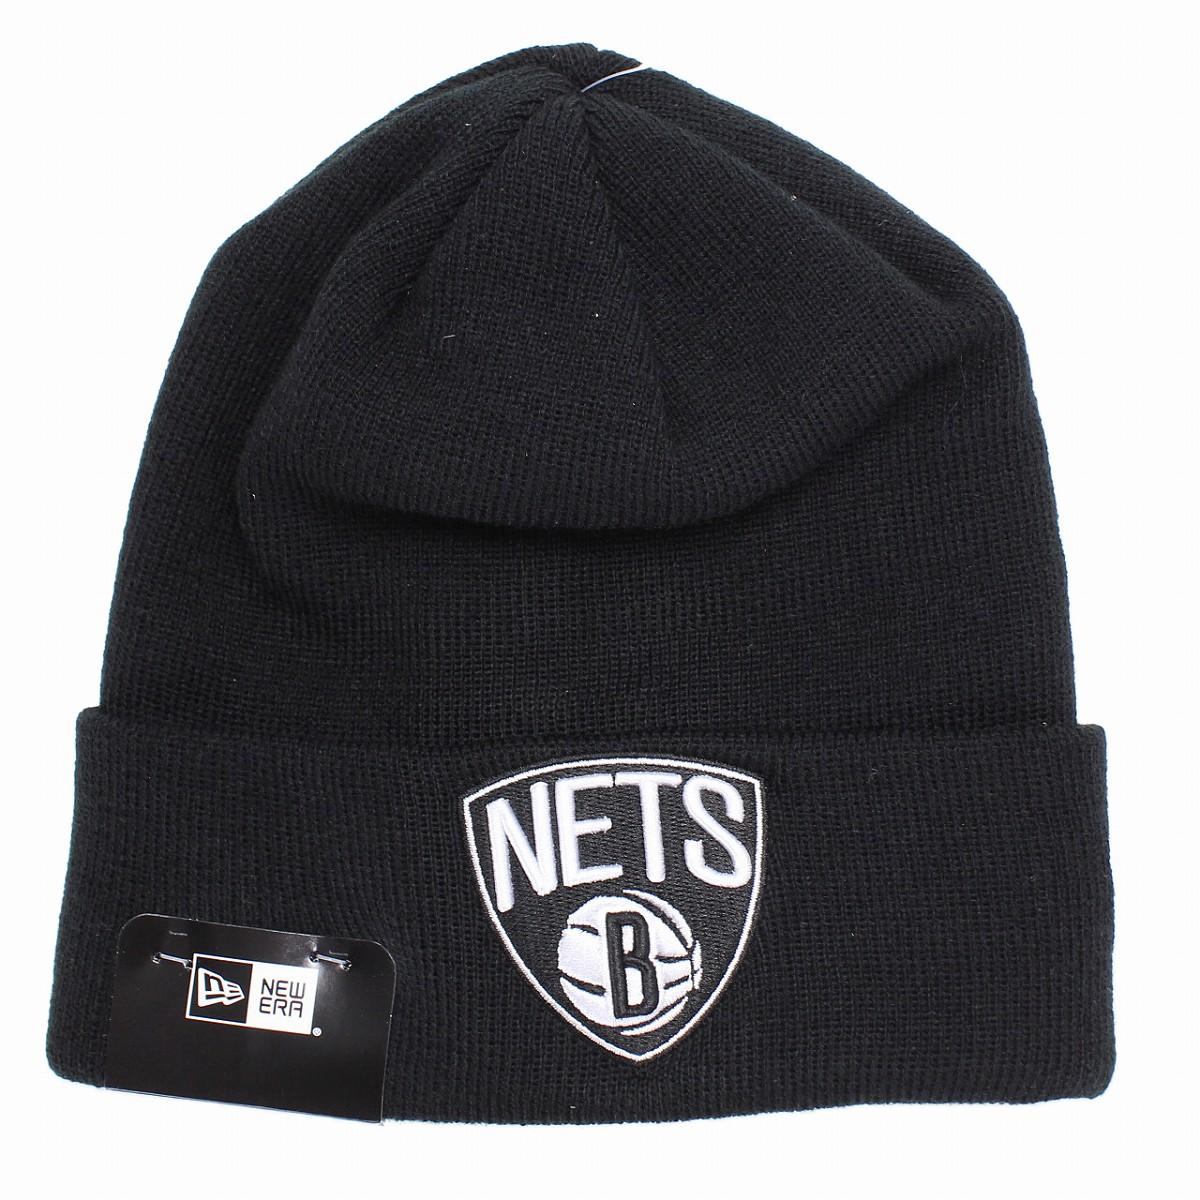 01d5ea960aa Brooklyn Nets knit hat ニューエラニットワッチチームロゴ NBA NEWERA Basic Cuff Knit black  beanie  cap  present man new gills hat mail order